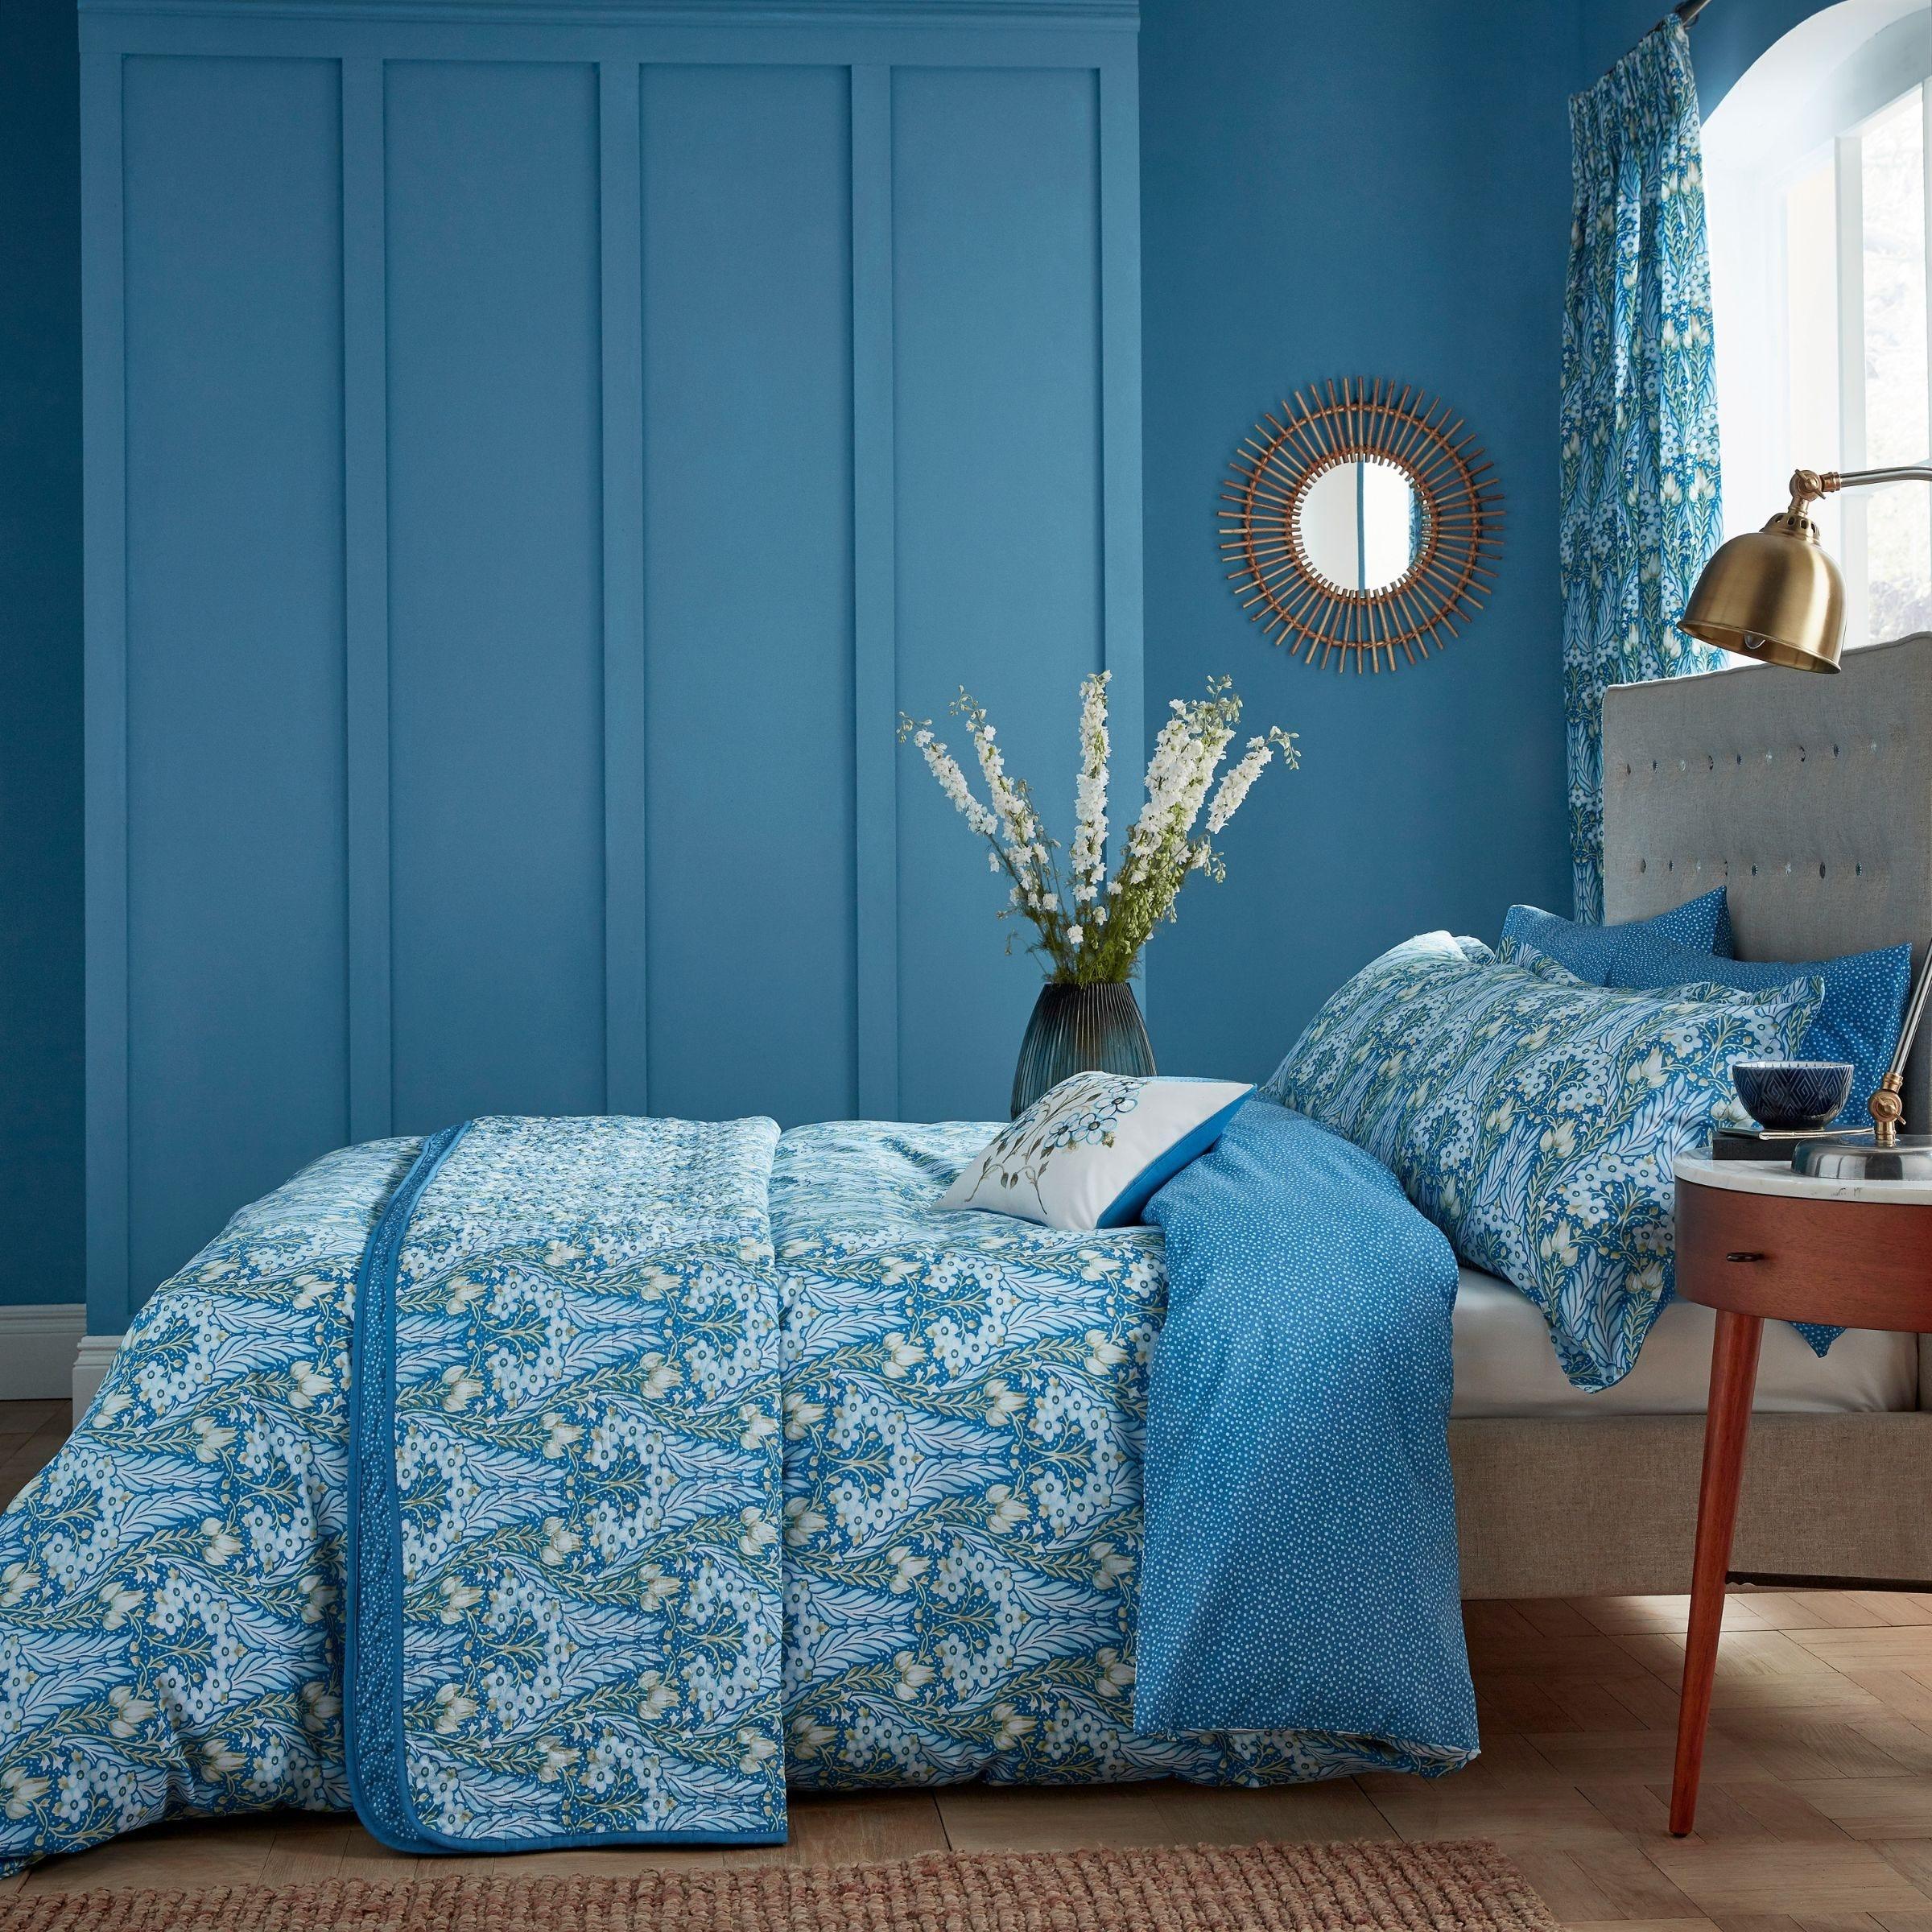 Alyssum Duvet Cover Set V&A Size: Single - 1 Standard Pillowcase